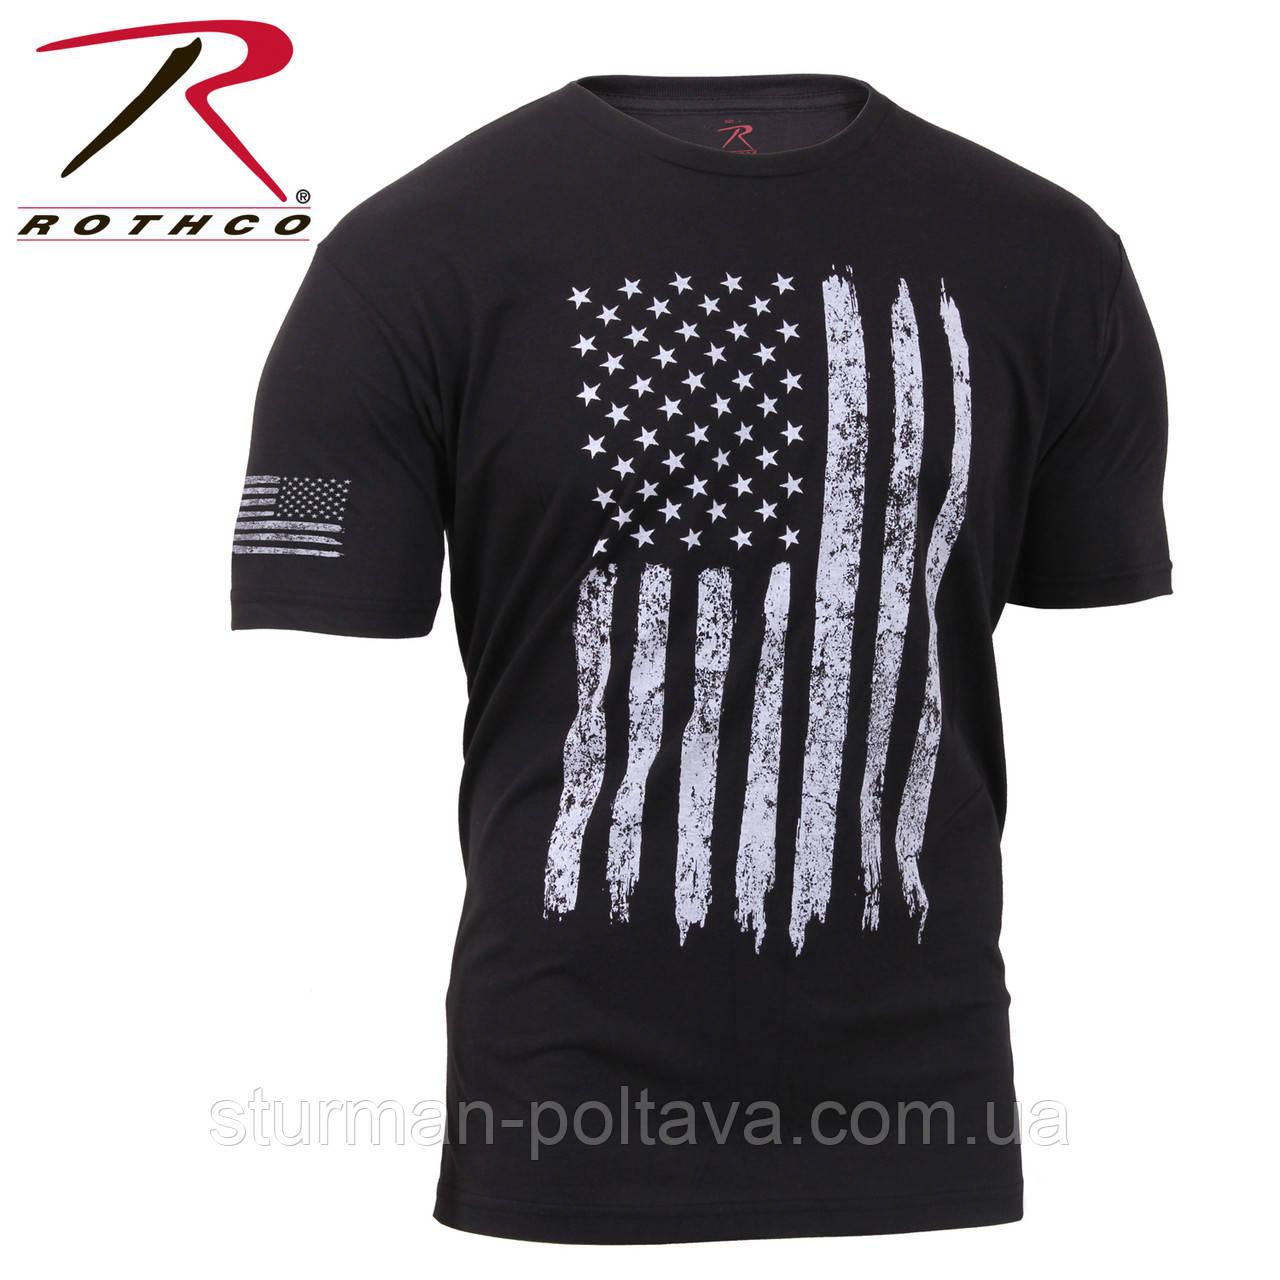 Футболка мужская винтажная патриотическая Distressed US Flag Athletic Fit с флагом США   черная   США